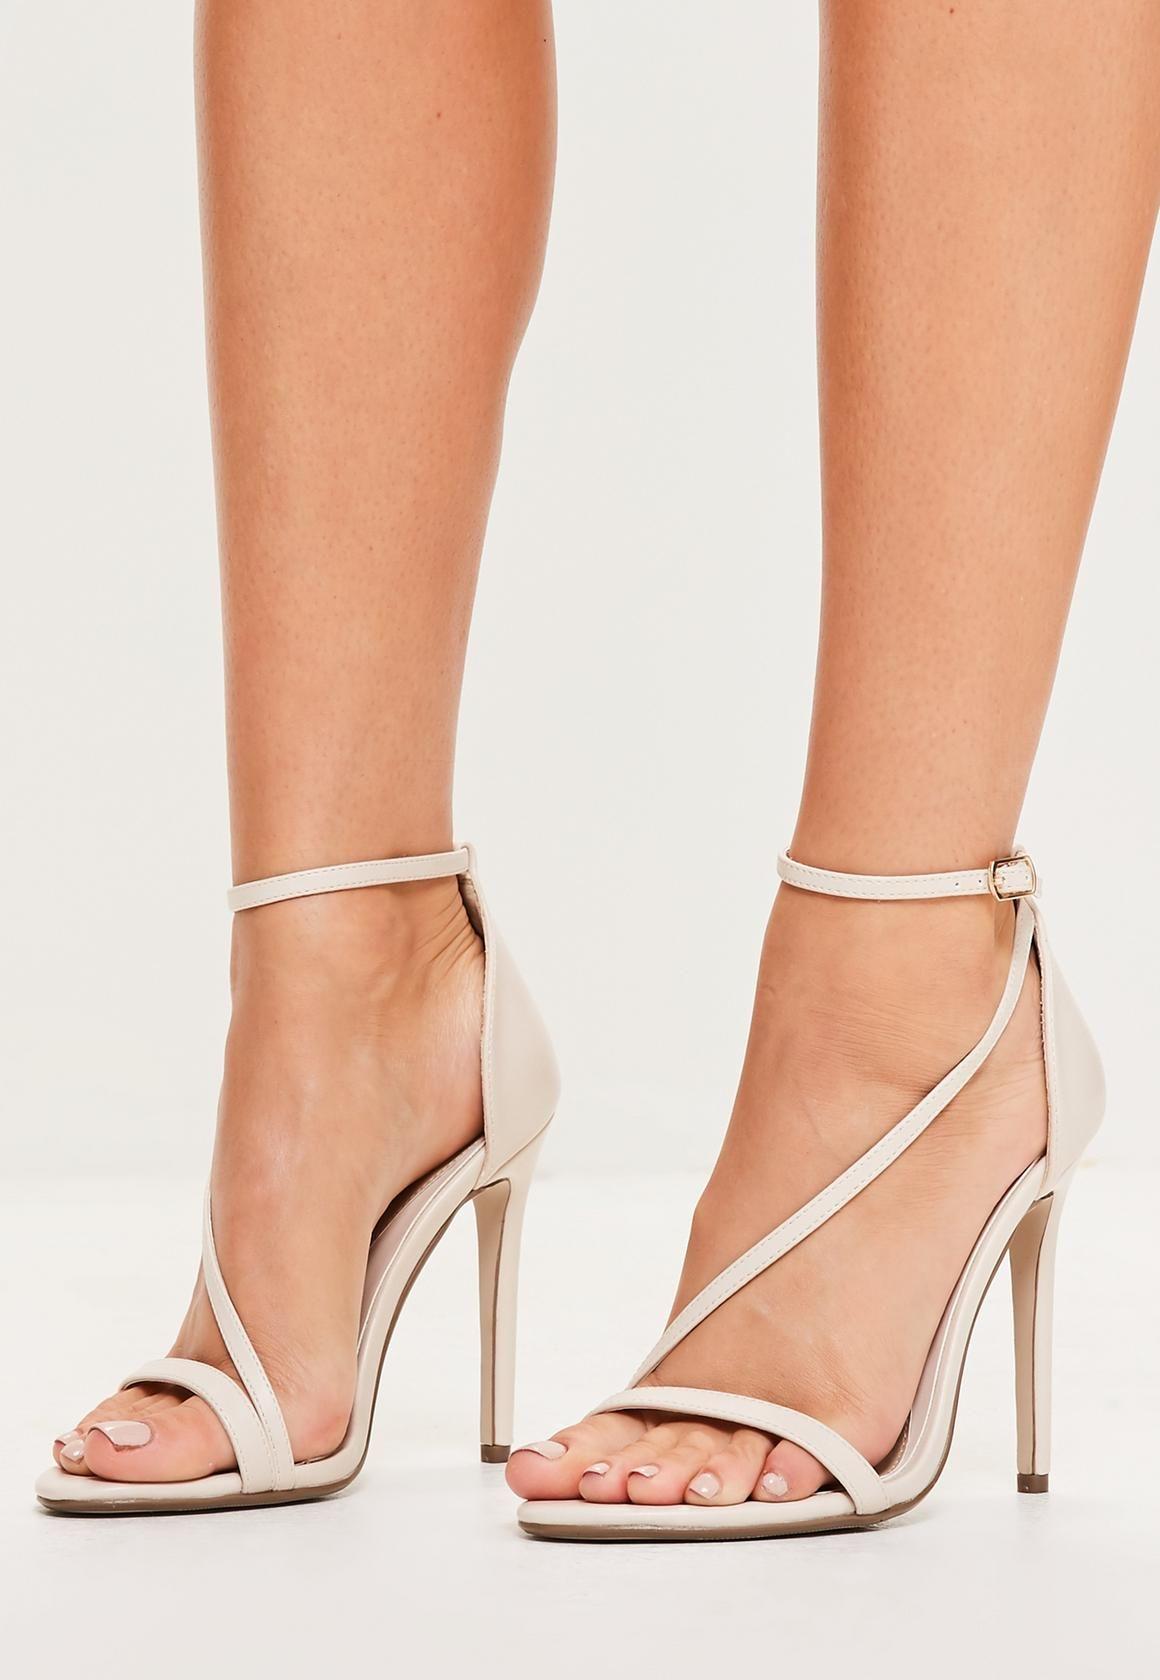 3eb3737c1de476 nude asymmetric barely there heels